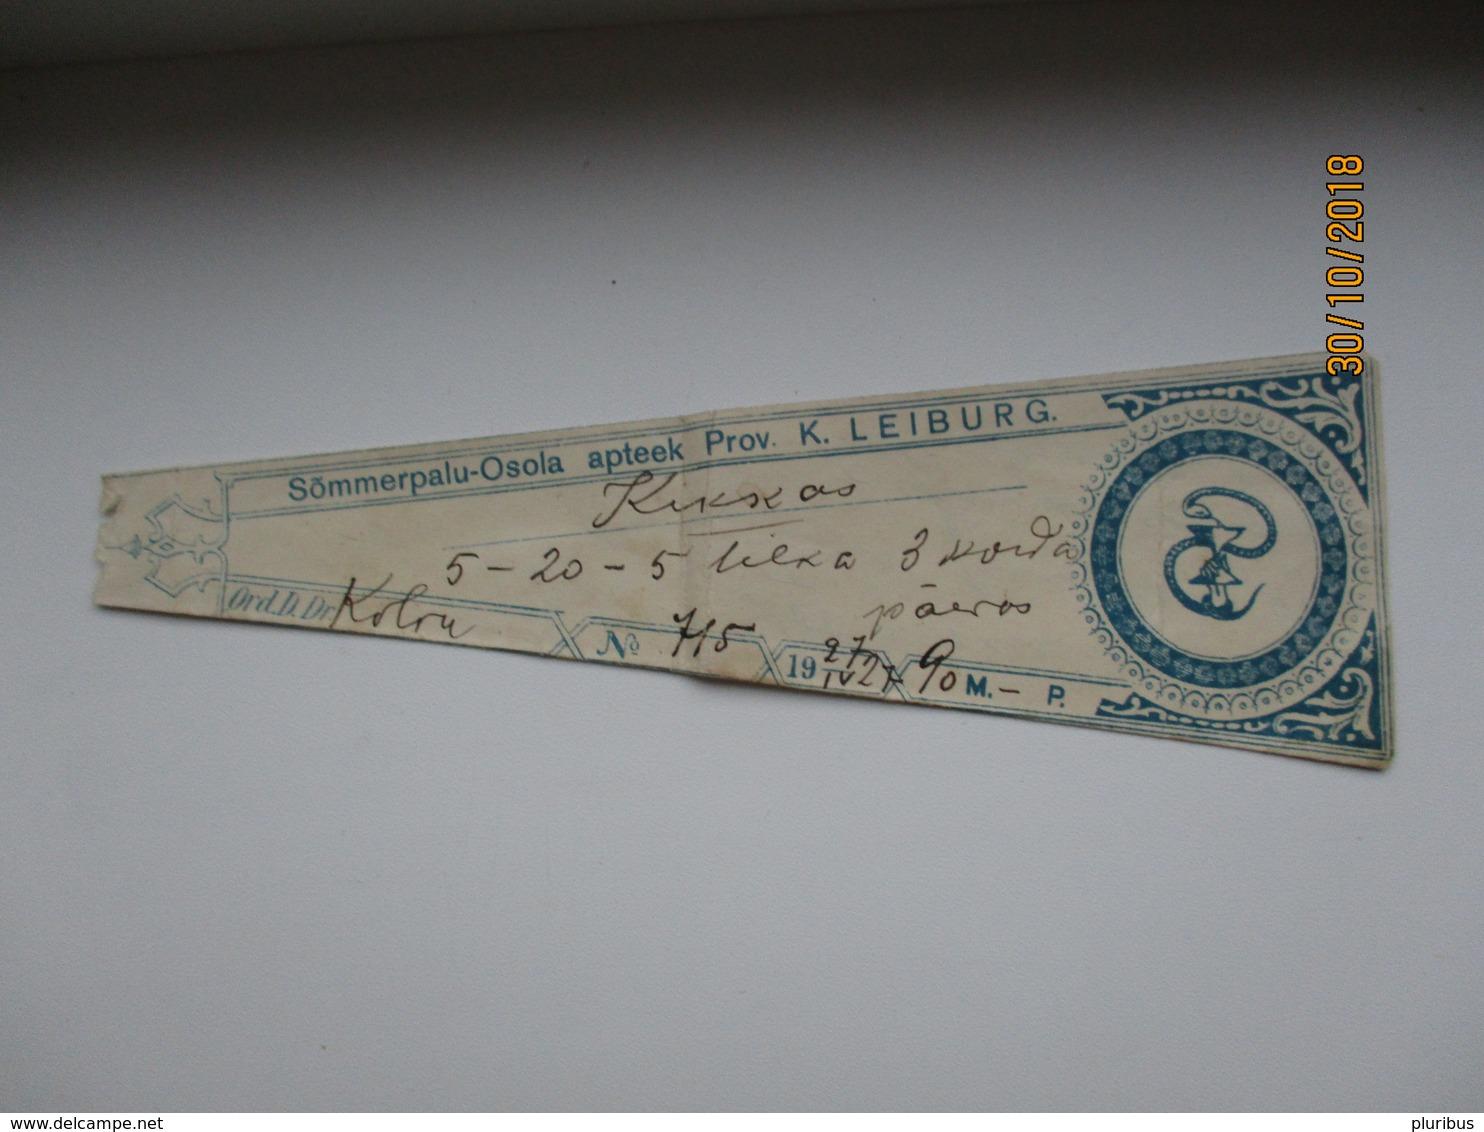 1927 ESTONIA   SÕMERPALU - OSULA  PHARMACY DRUG  LABEL   , K. LEIBURG  , 0 - Vecchi Documenti